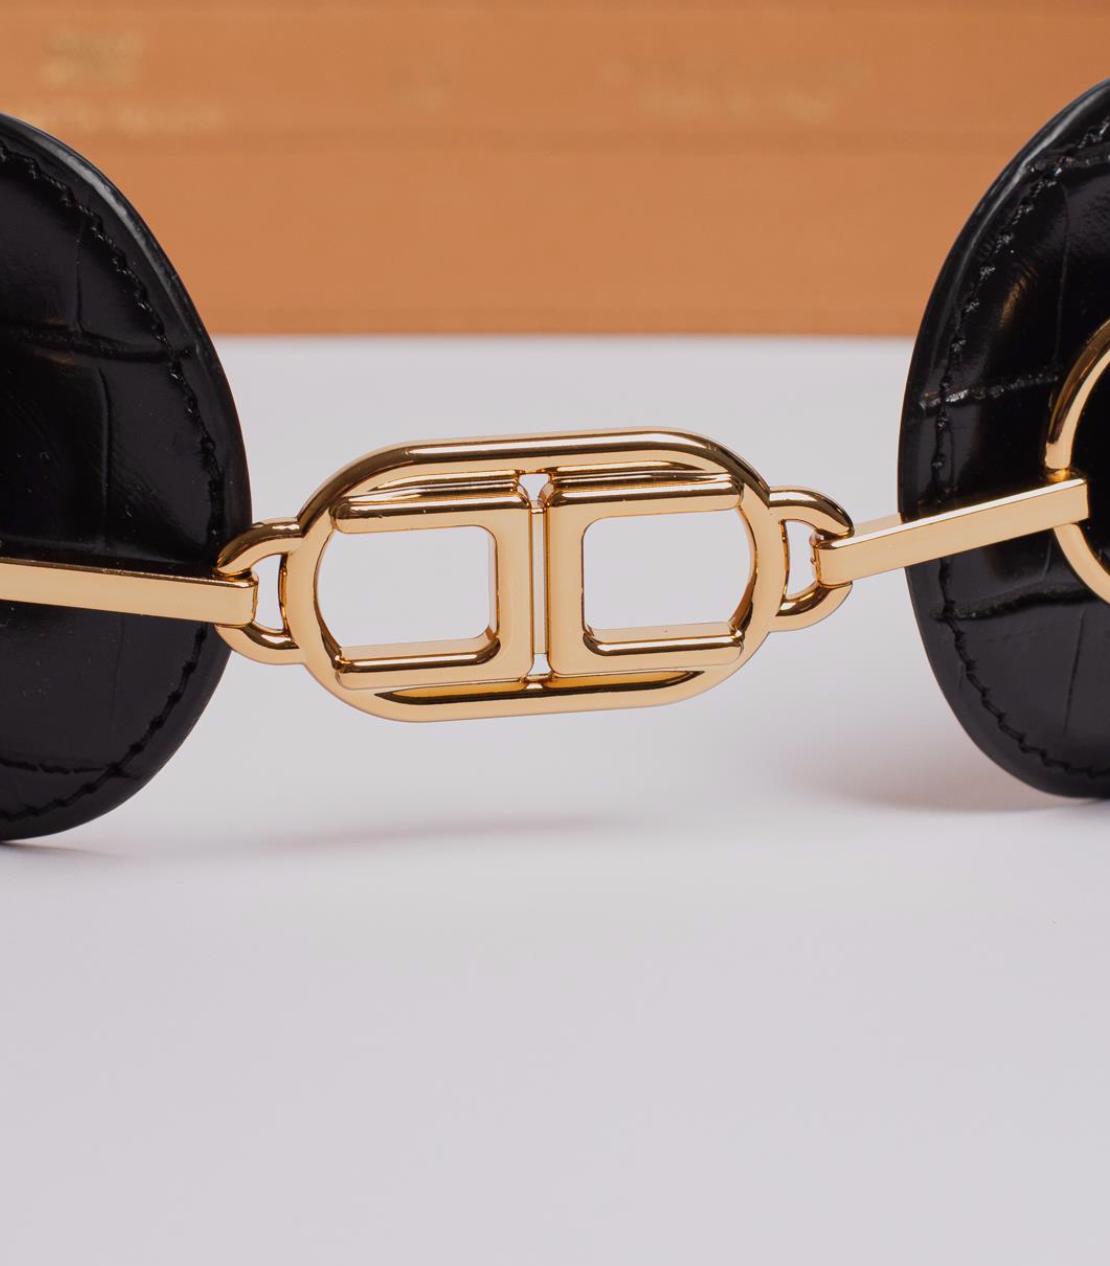 Cintura alta con morsetto logato Elisabetta Franchi ELISABETTA FRANCHI | Cintura | CT60S07E2110